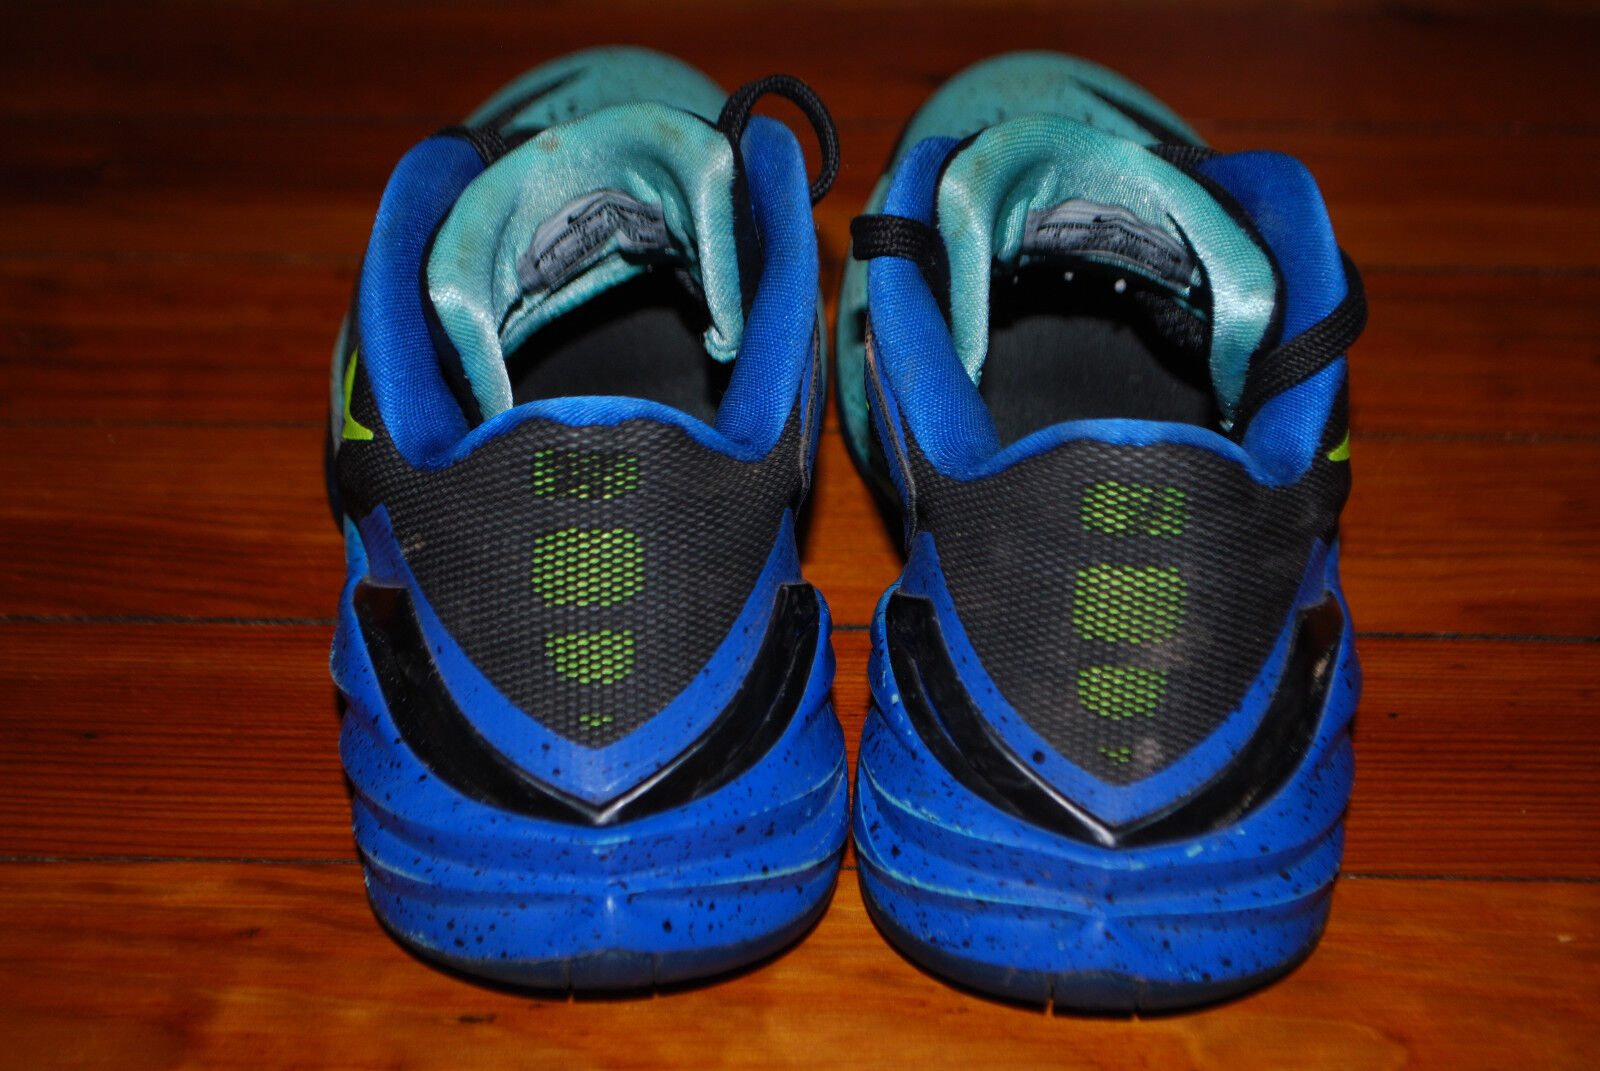 Gli Uomini Sono Nike Hyperdunk Basso City Pack Washington Dc   Dc (8) 706503-073 a467d5